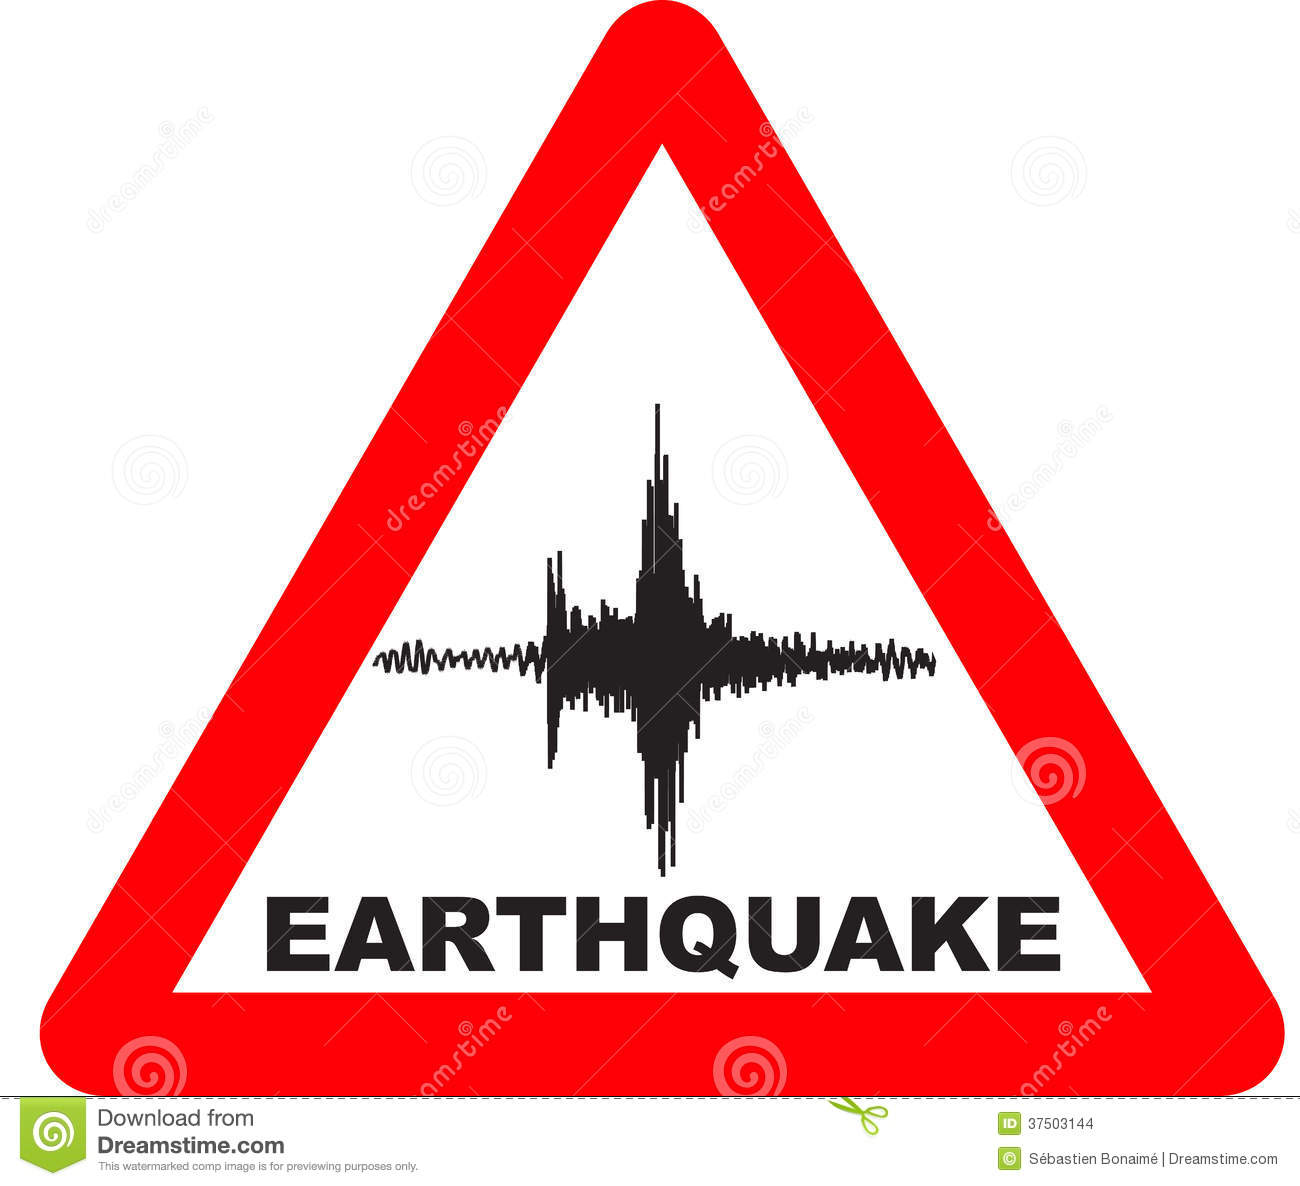 Warning sign stock panda. Earthquake clipart seismologist